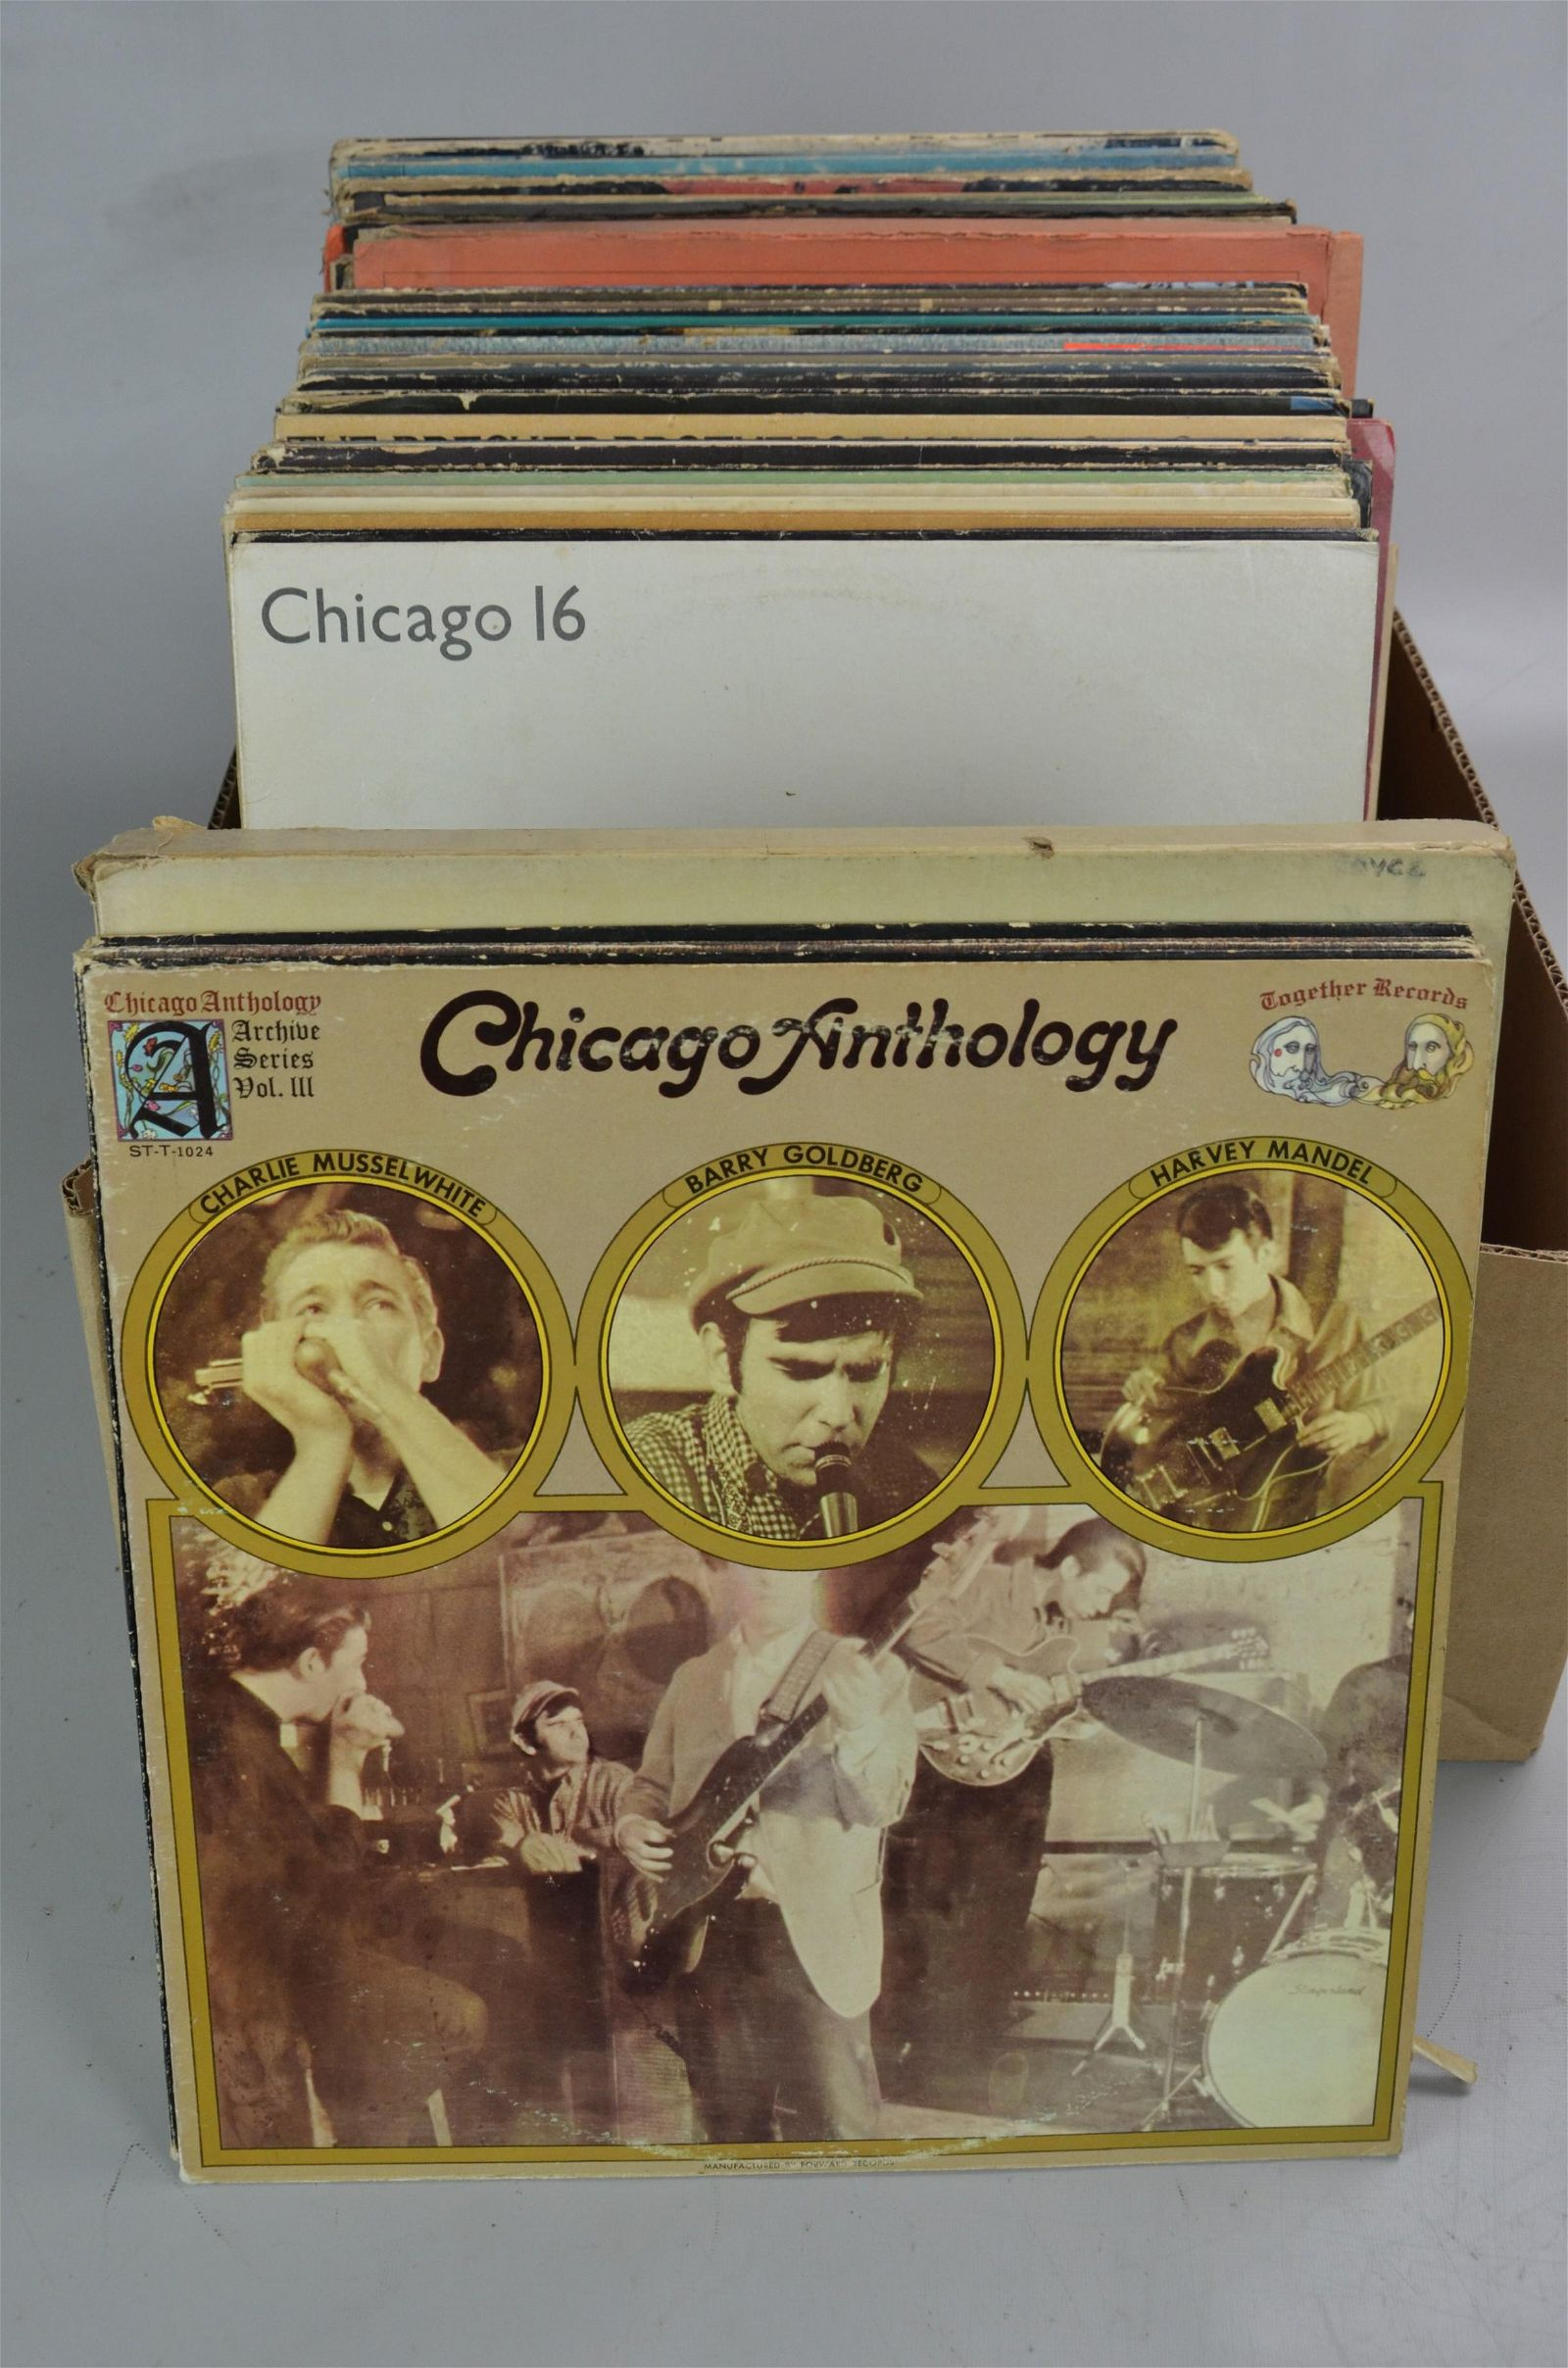 Lof of 83 Classic Rock 33-1/3 Records